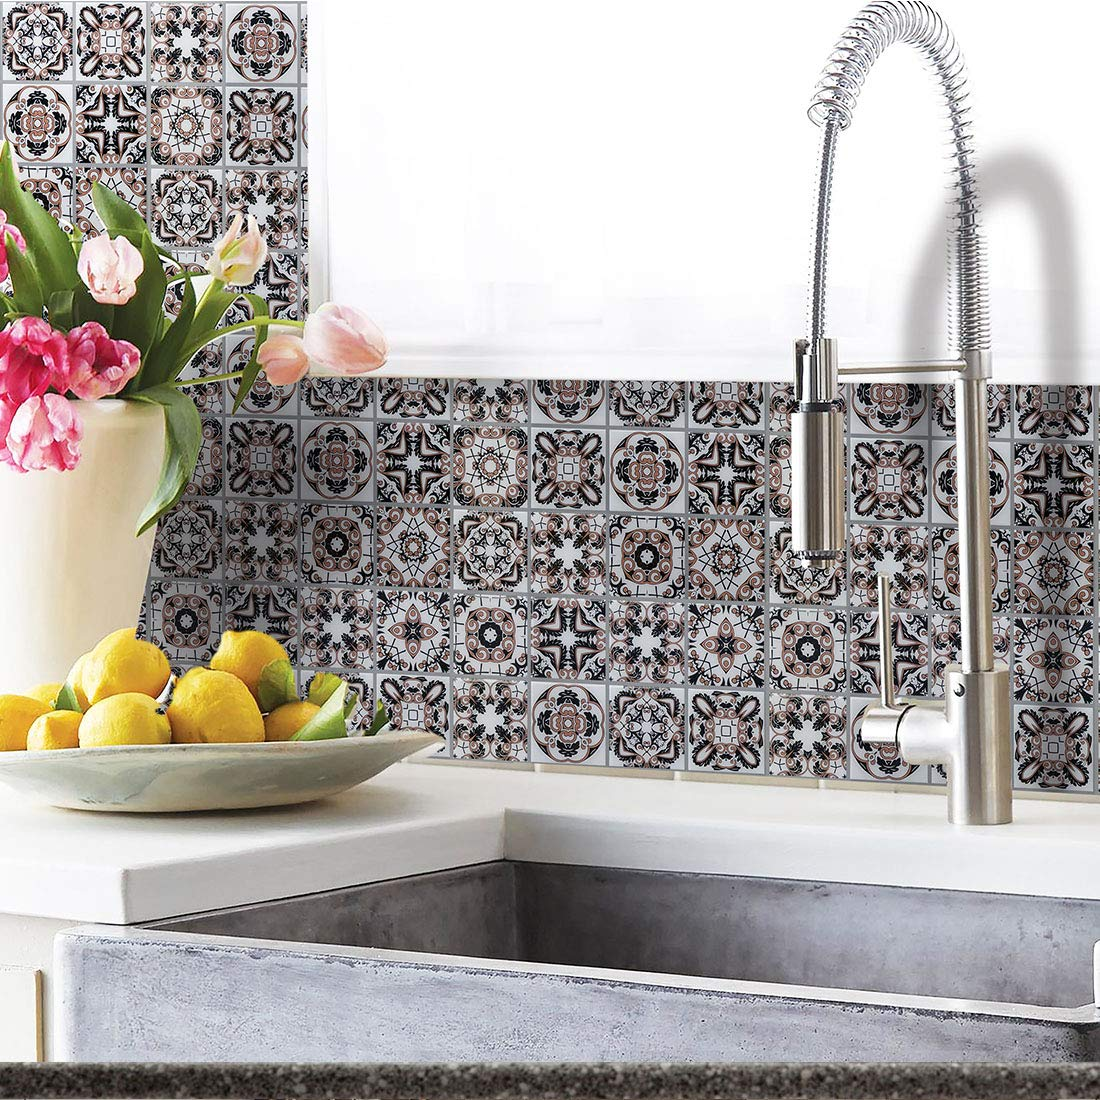 Hue Decoration Blue Moroccan Peel And Stick Tile Backsplash Anti